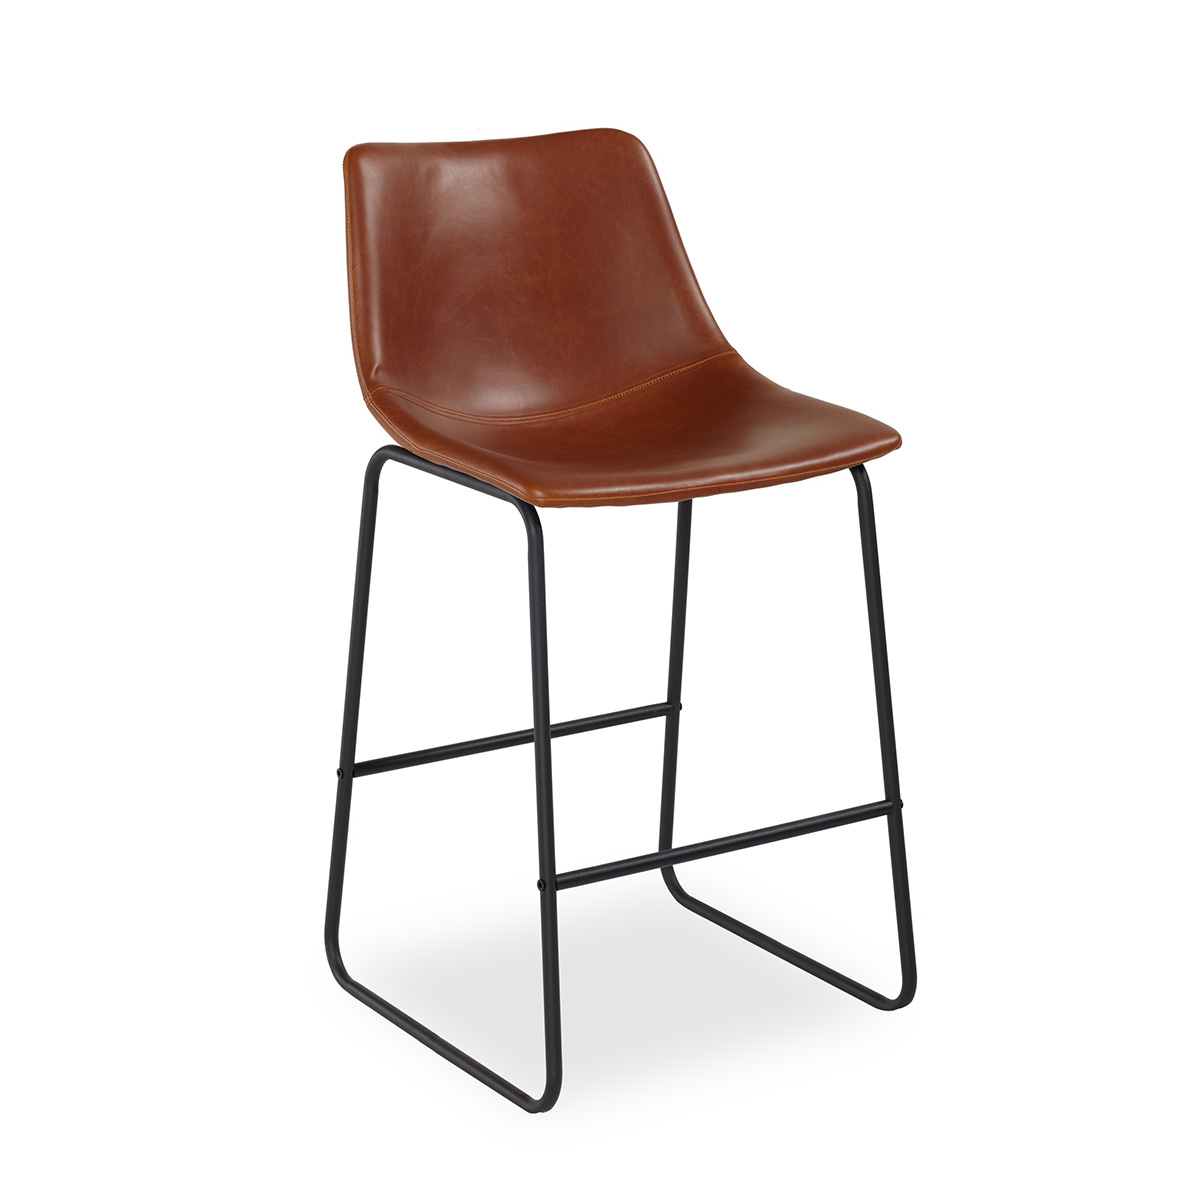 Барный стул Vermut коричневыйБарные стулья<br><br>